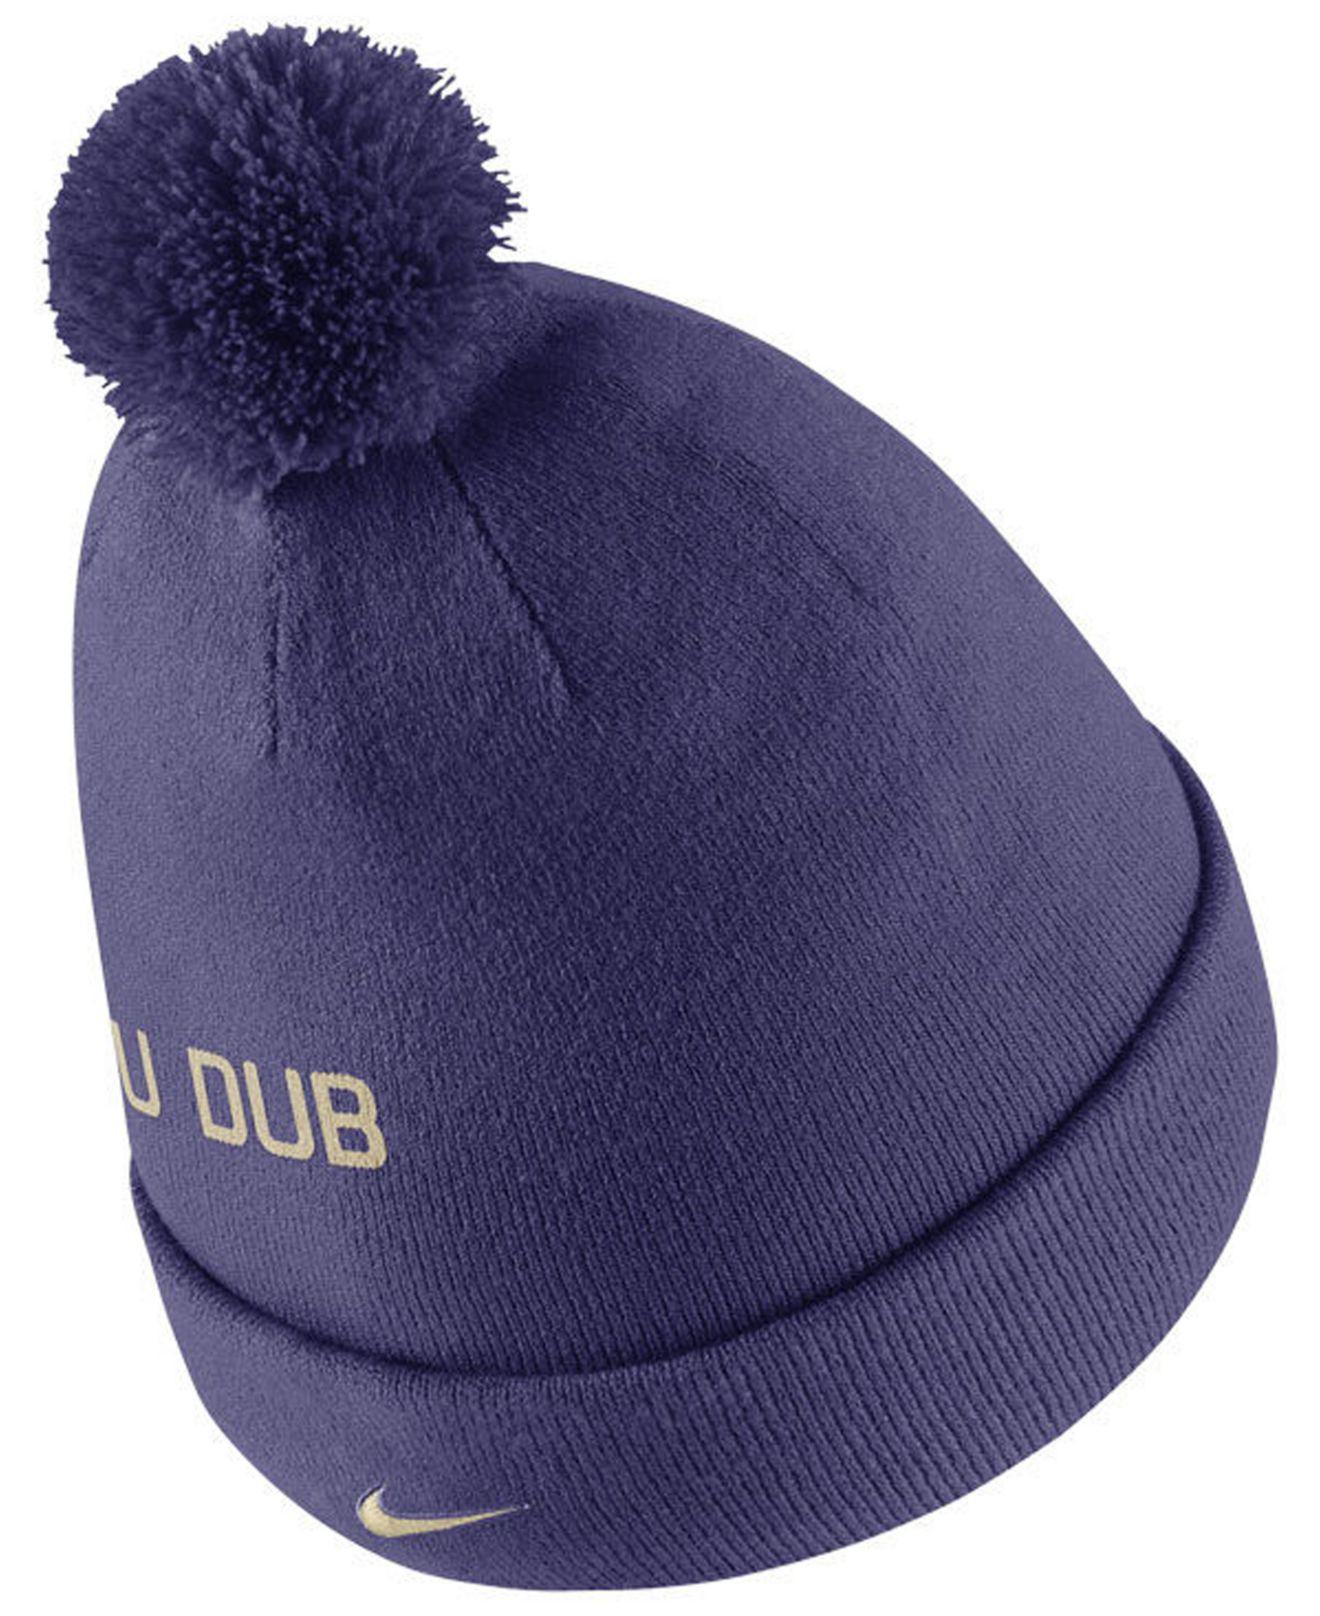 be64aa0ed01 Nike - Blue Washington Huskies Striped Beanie Knit Hat for Men - Lyst. View  fullscreen